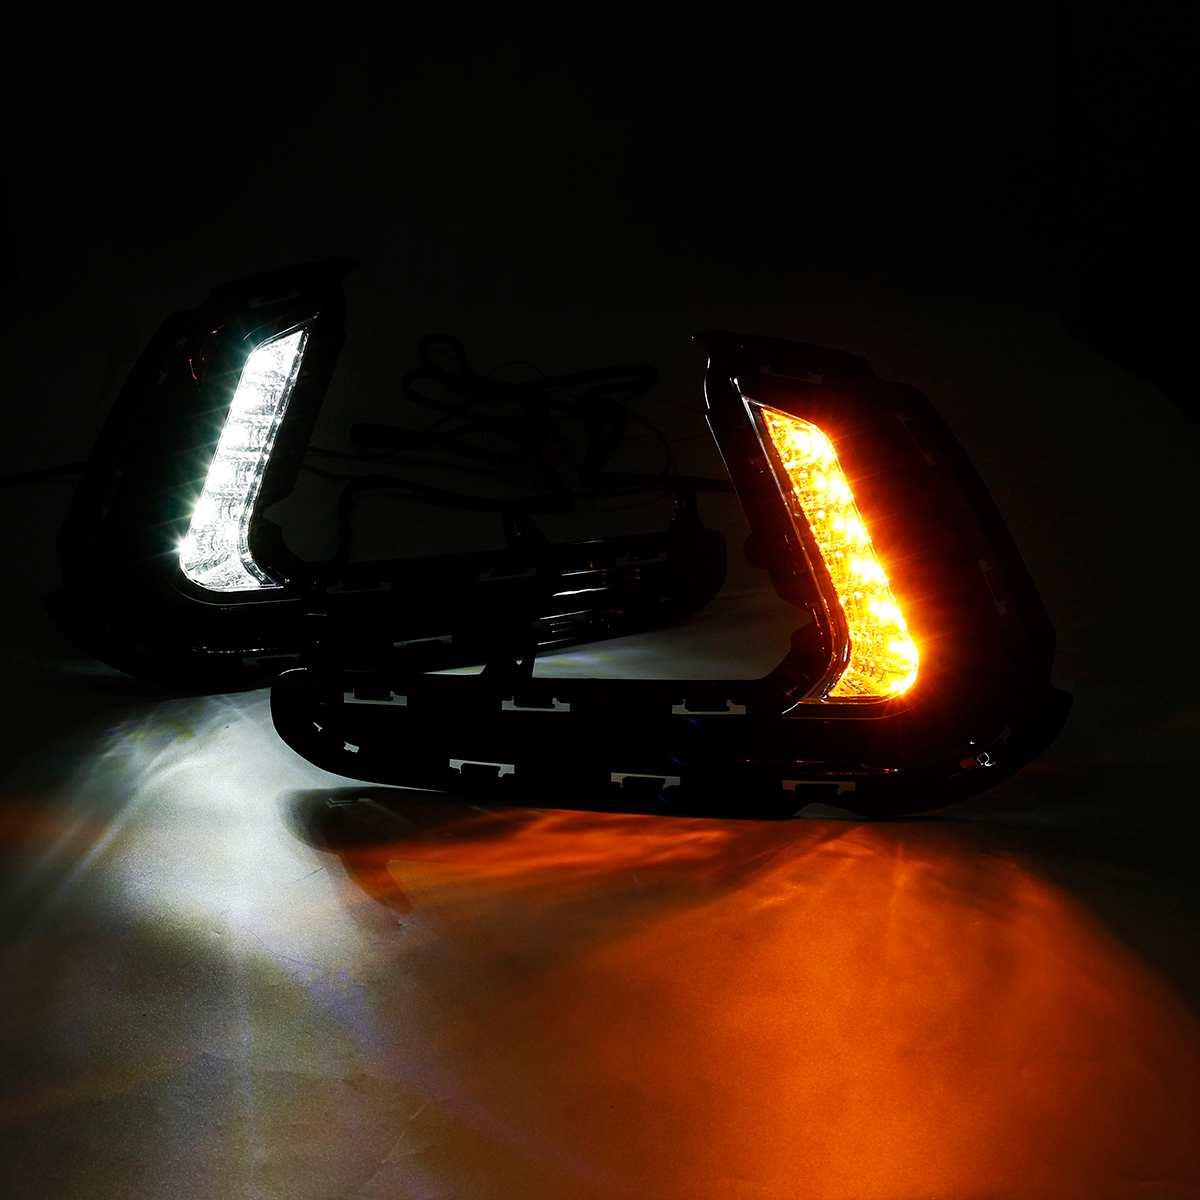 1 Pair LED Car Daytime Running Light DRL Front Bumper Fog Turn Signal Lamp for Hyundai Elantra 2017 2018 Car Styling With Wire1 Pair LED Car Daytime Running Light DRL Front Bumper Fog Turn Signal Lamp for Hyundai Elantra 2017 2018 Car Styling With Wire